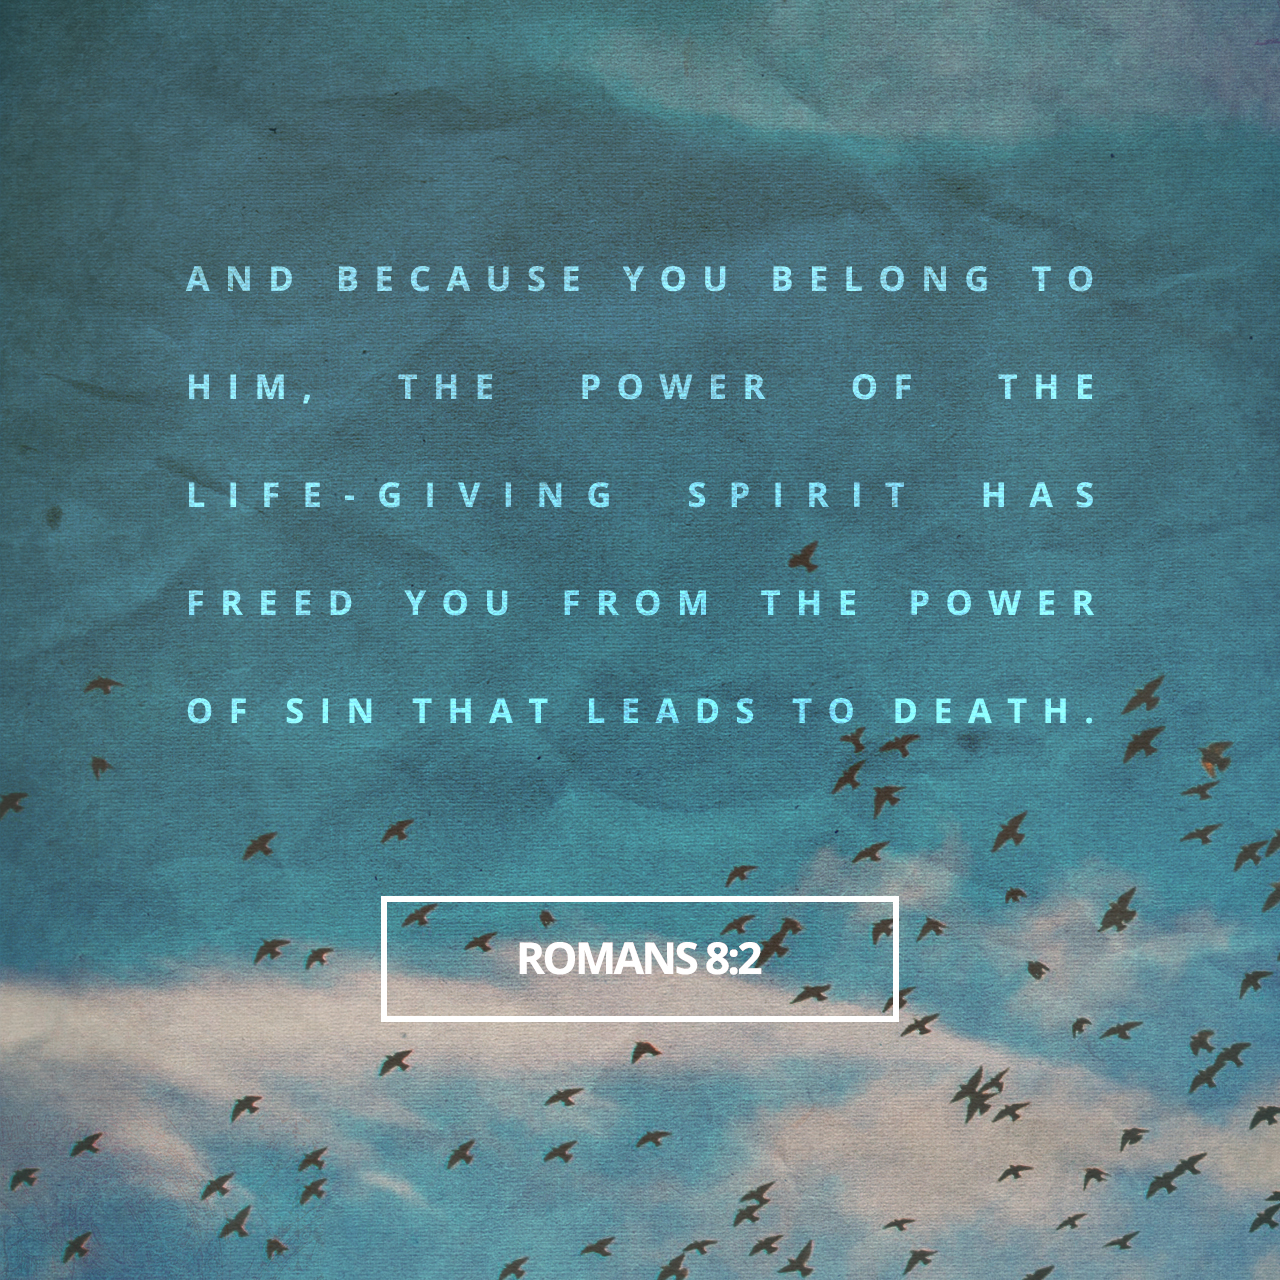 Romans 8:2